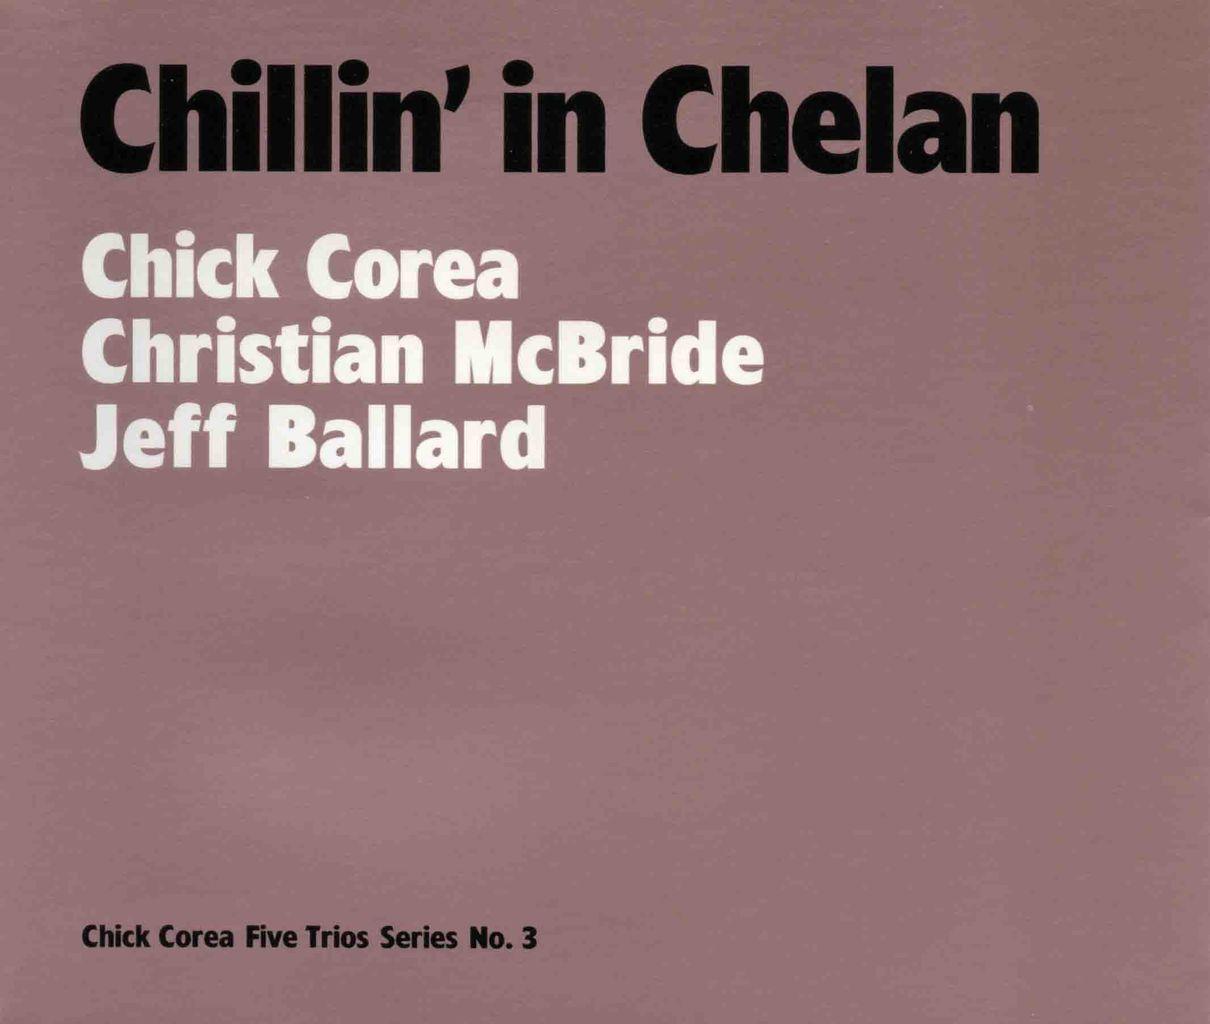 CHILLIN' IN CHELAN-1